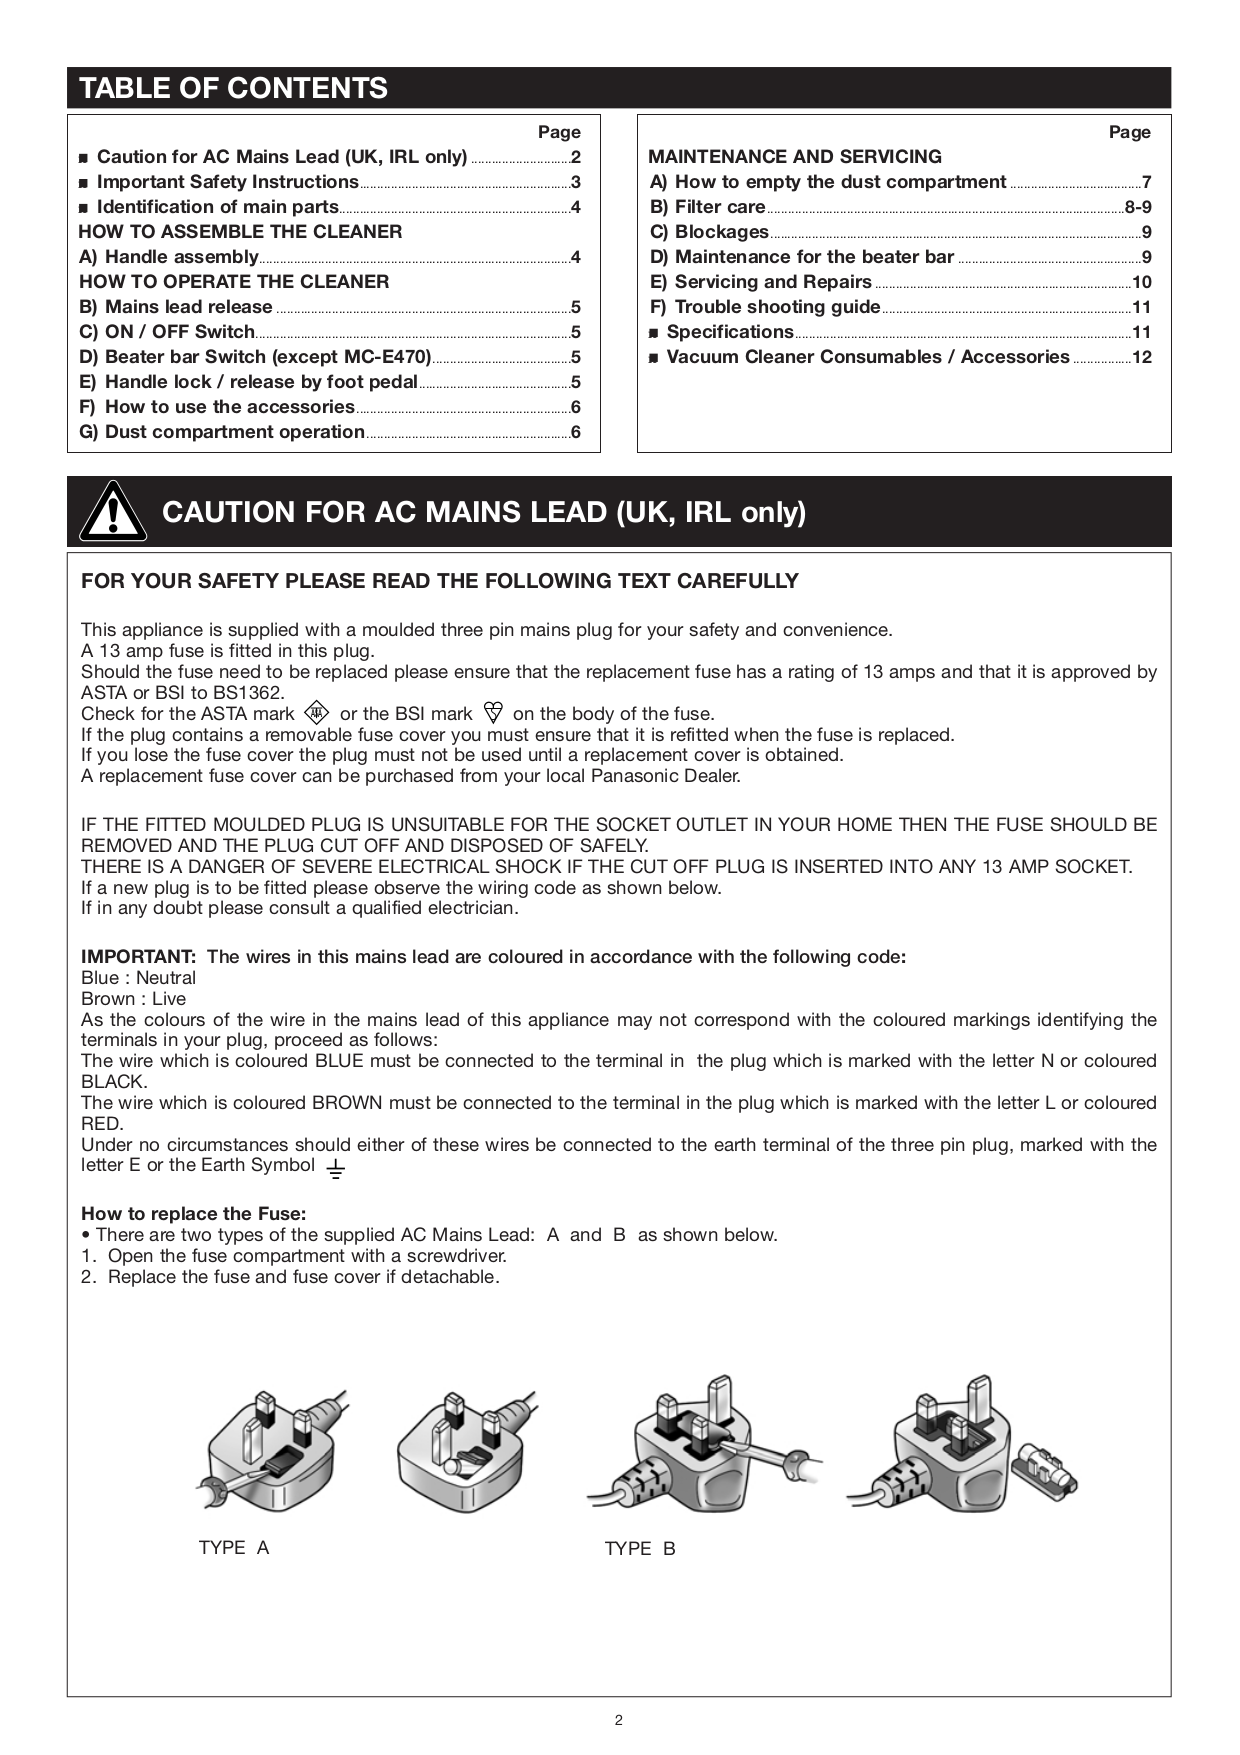 PDF manual for Panasonic Vacuum MC-V315